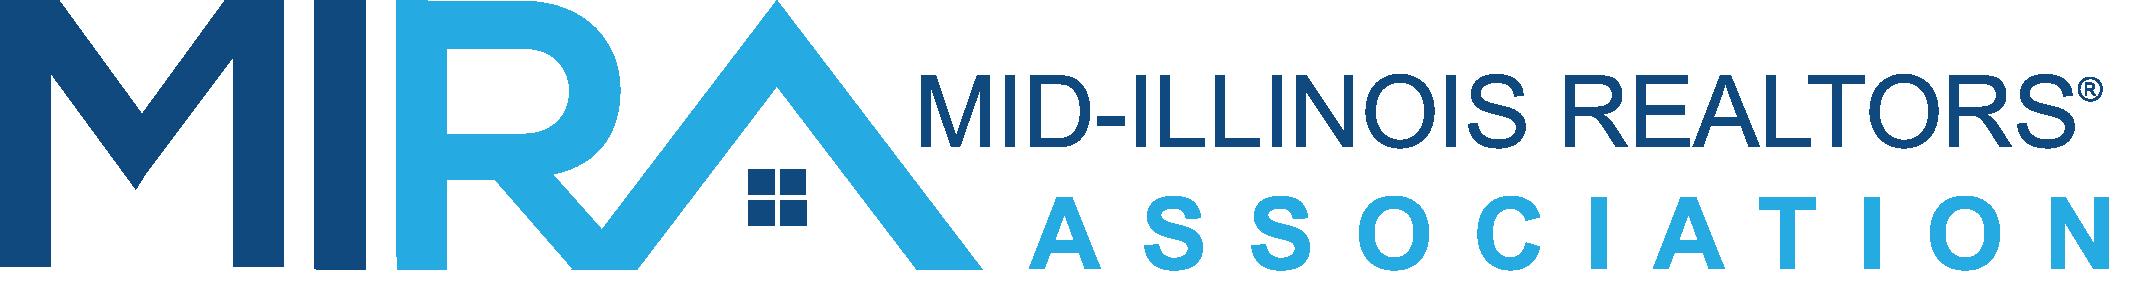 Mid-Illinois REALTORS® Association Logo